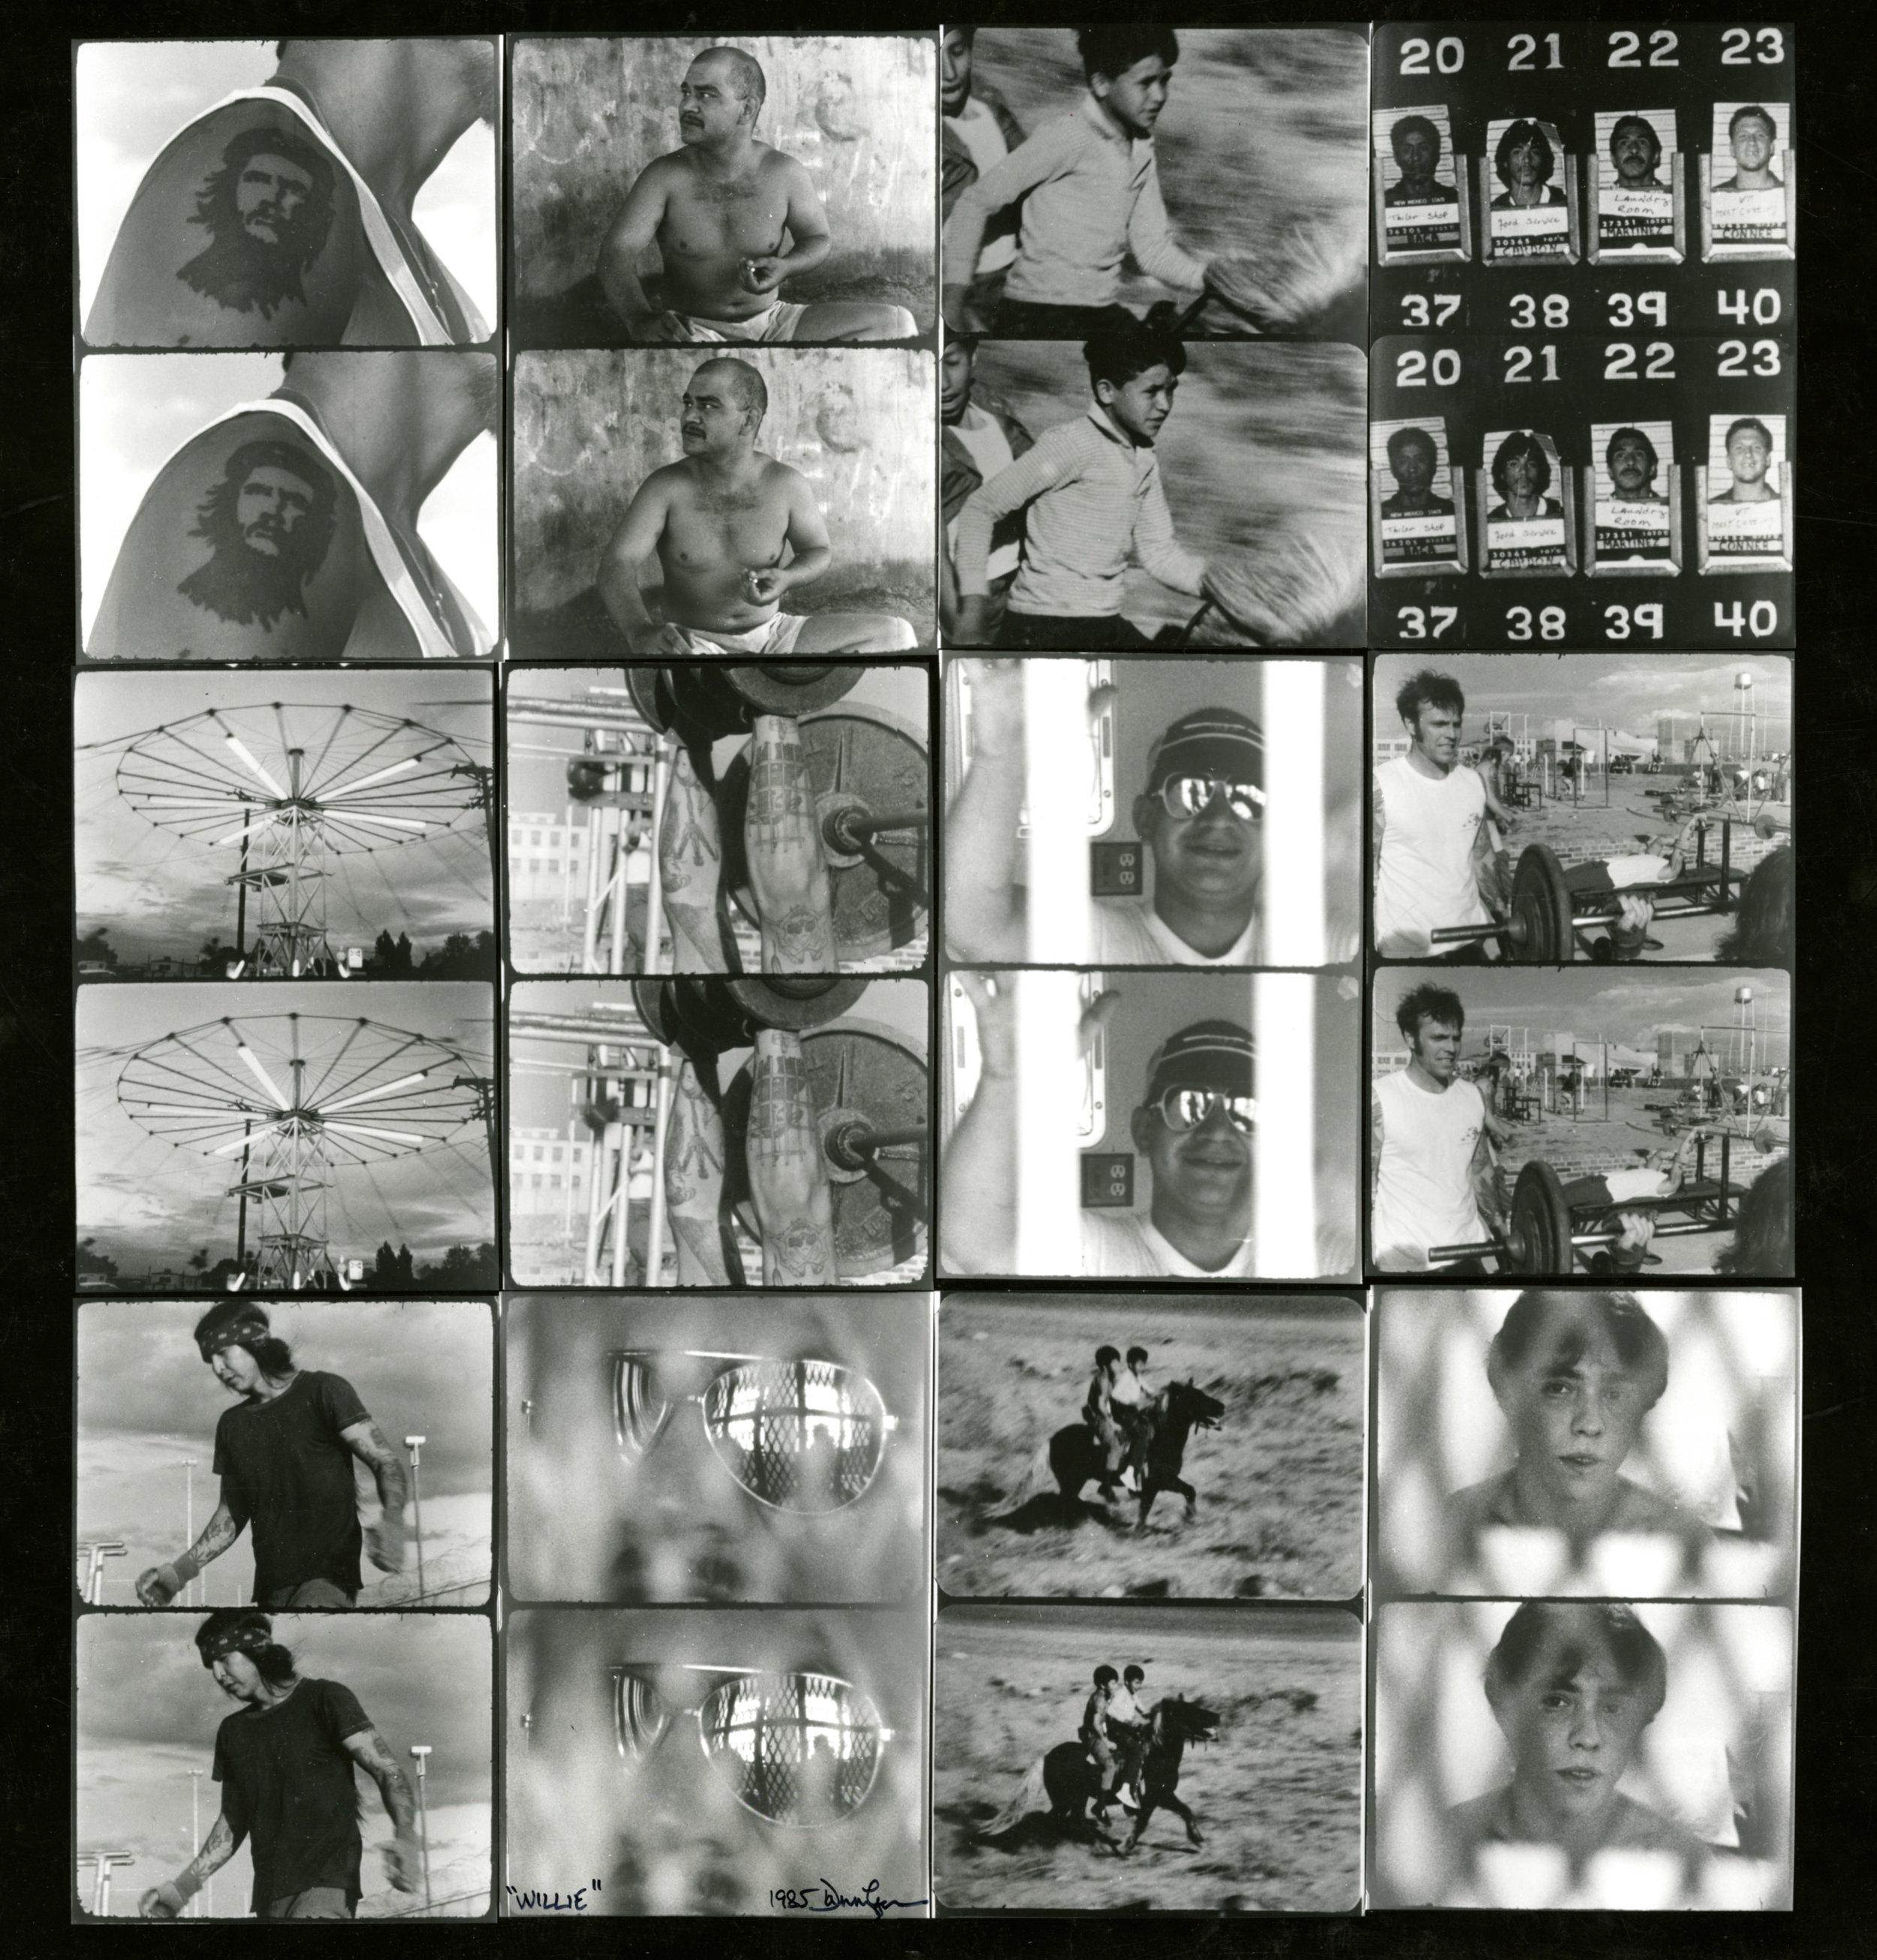 Willie Montage 2 complete copy copy.jpg